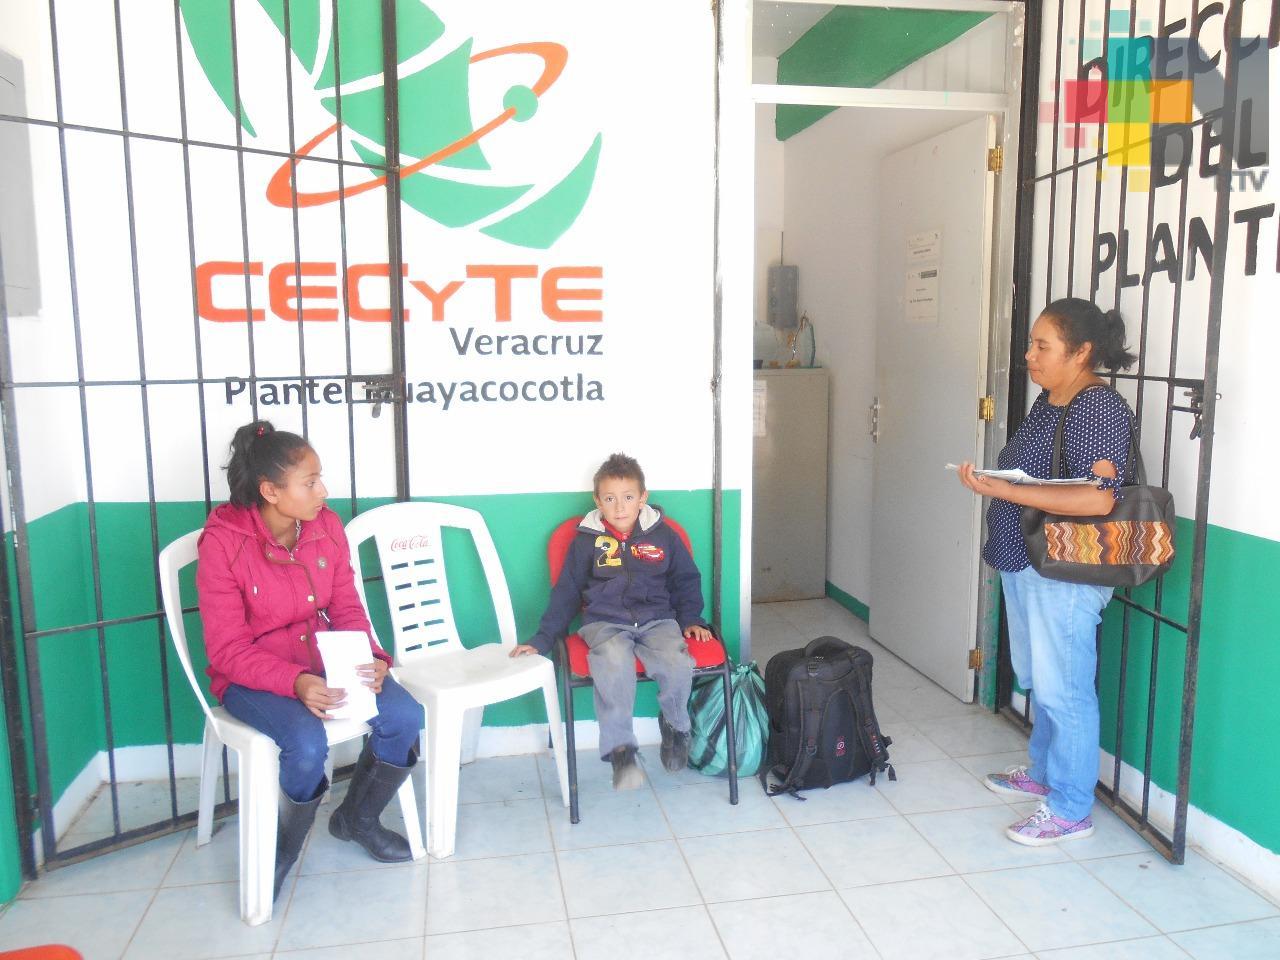 Cecytev Huayacocotla, una oferta educativa en la huasteca veracruzana